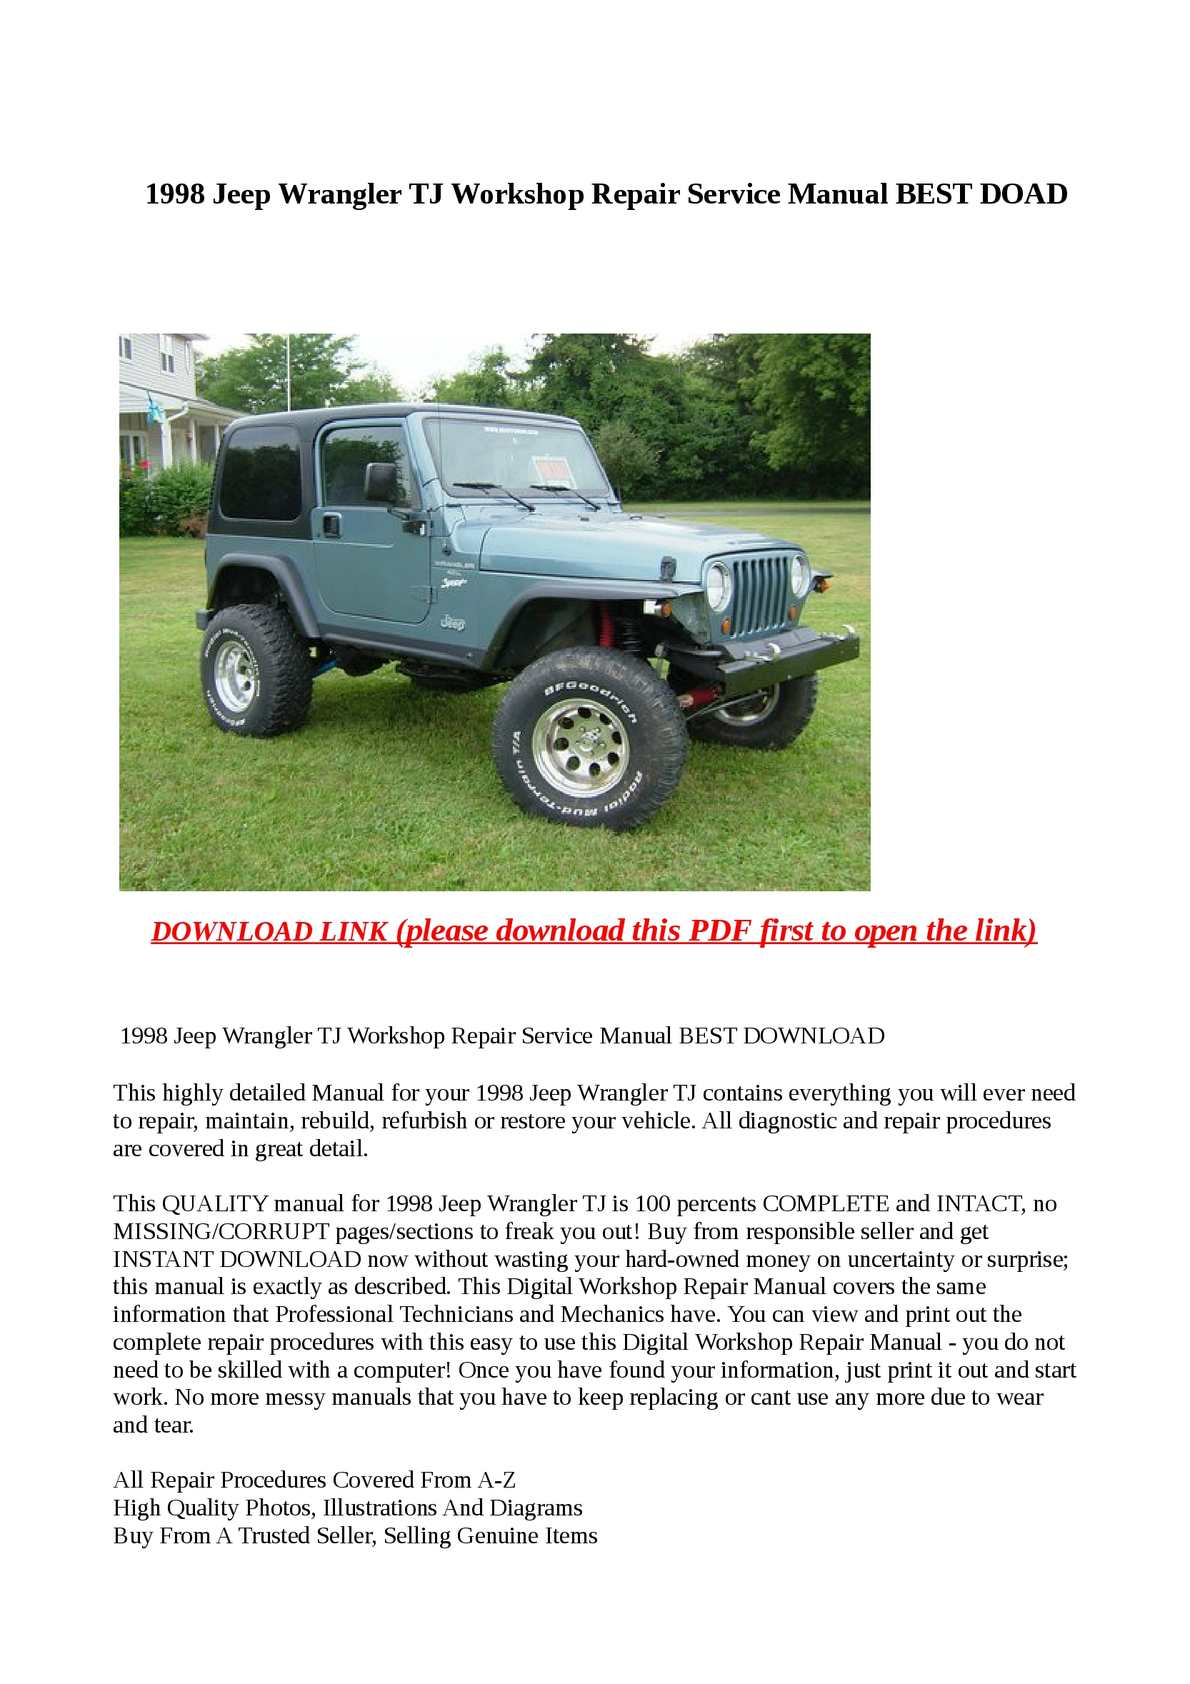 Calamo 1998 Jeep Wrangler Tj Workshop Repair Service Manual Best Doad Hardtop For Wiring Diagram